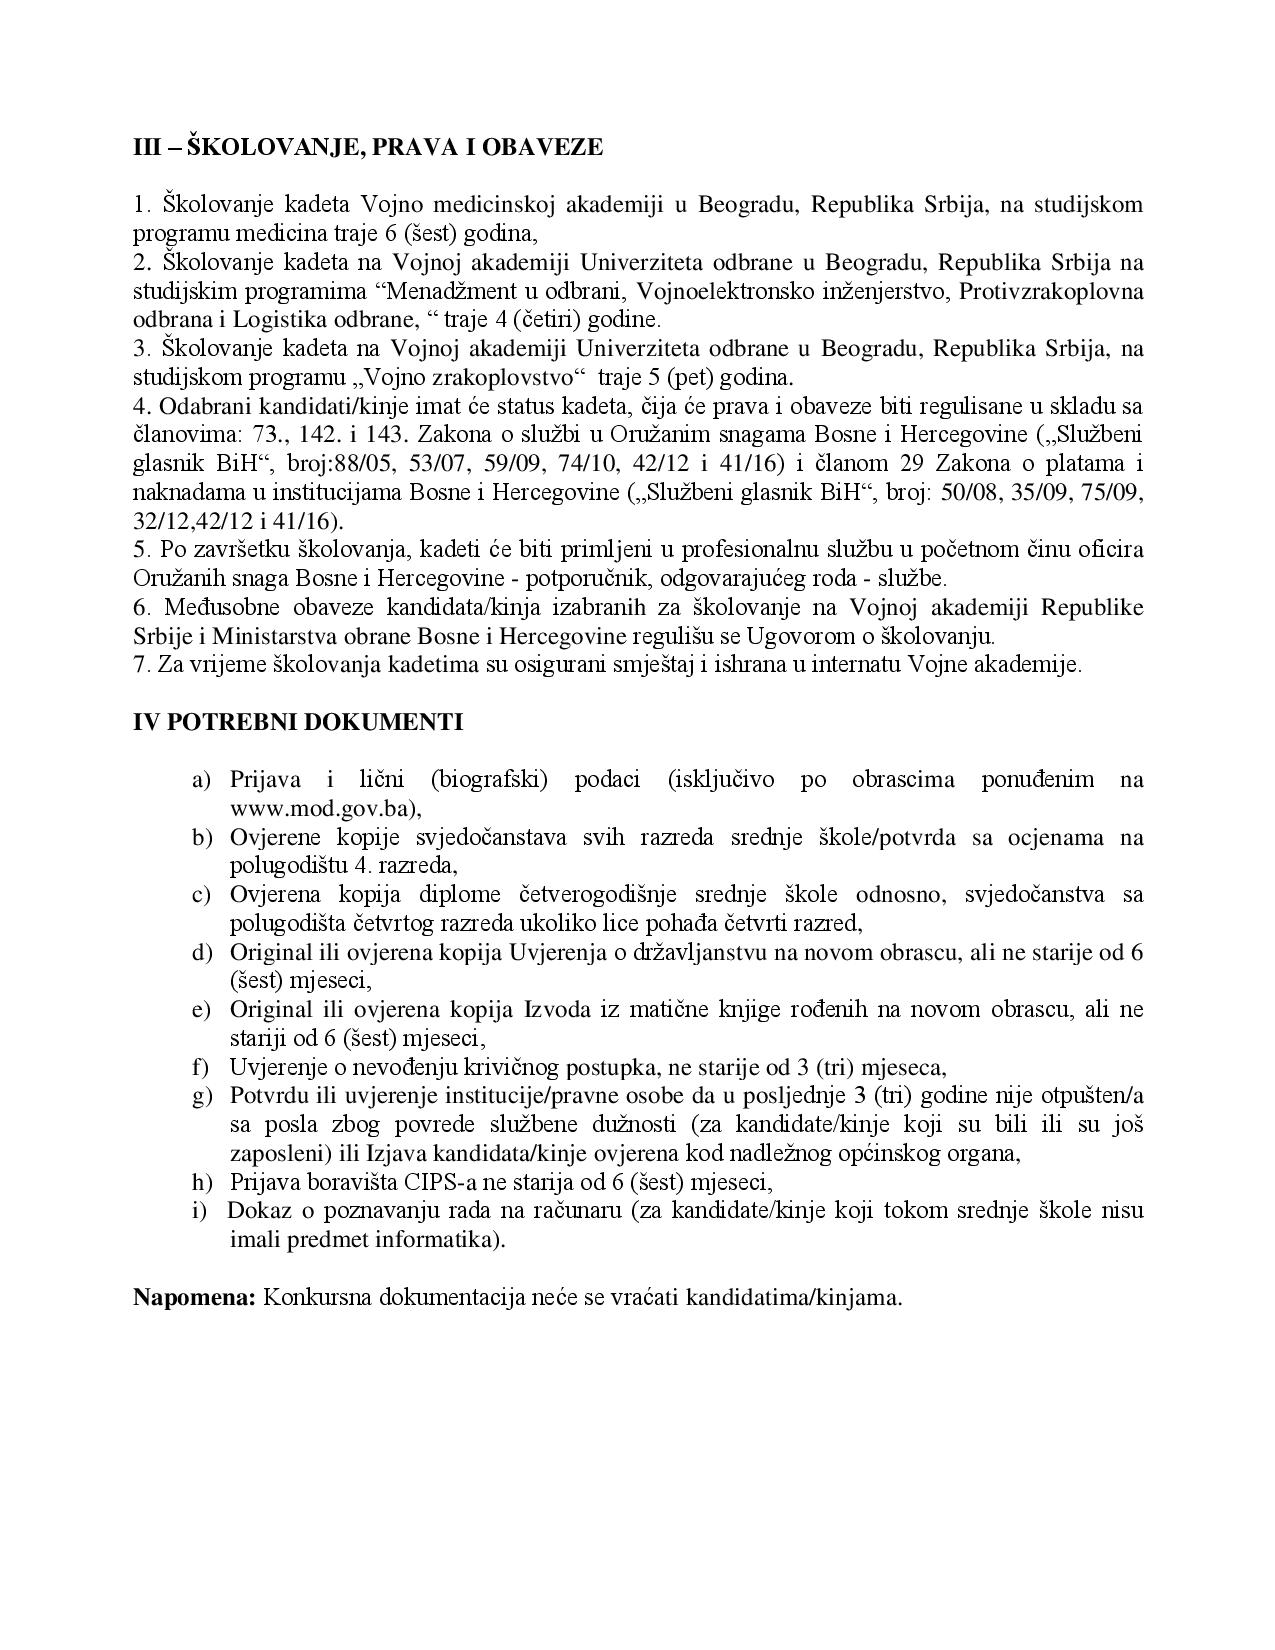 JAVNI KONKURS-page-003